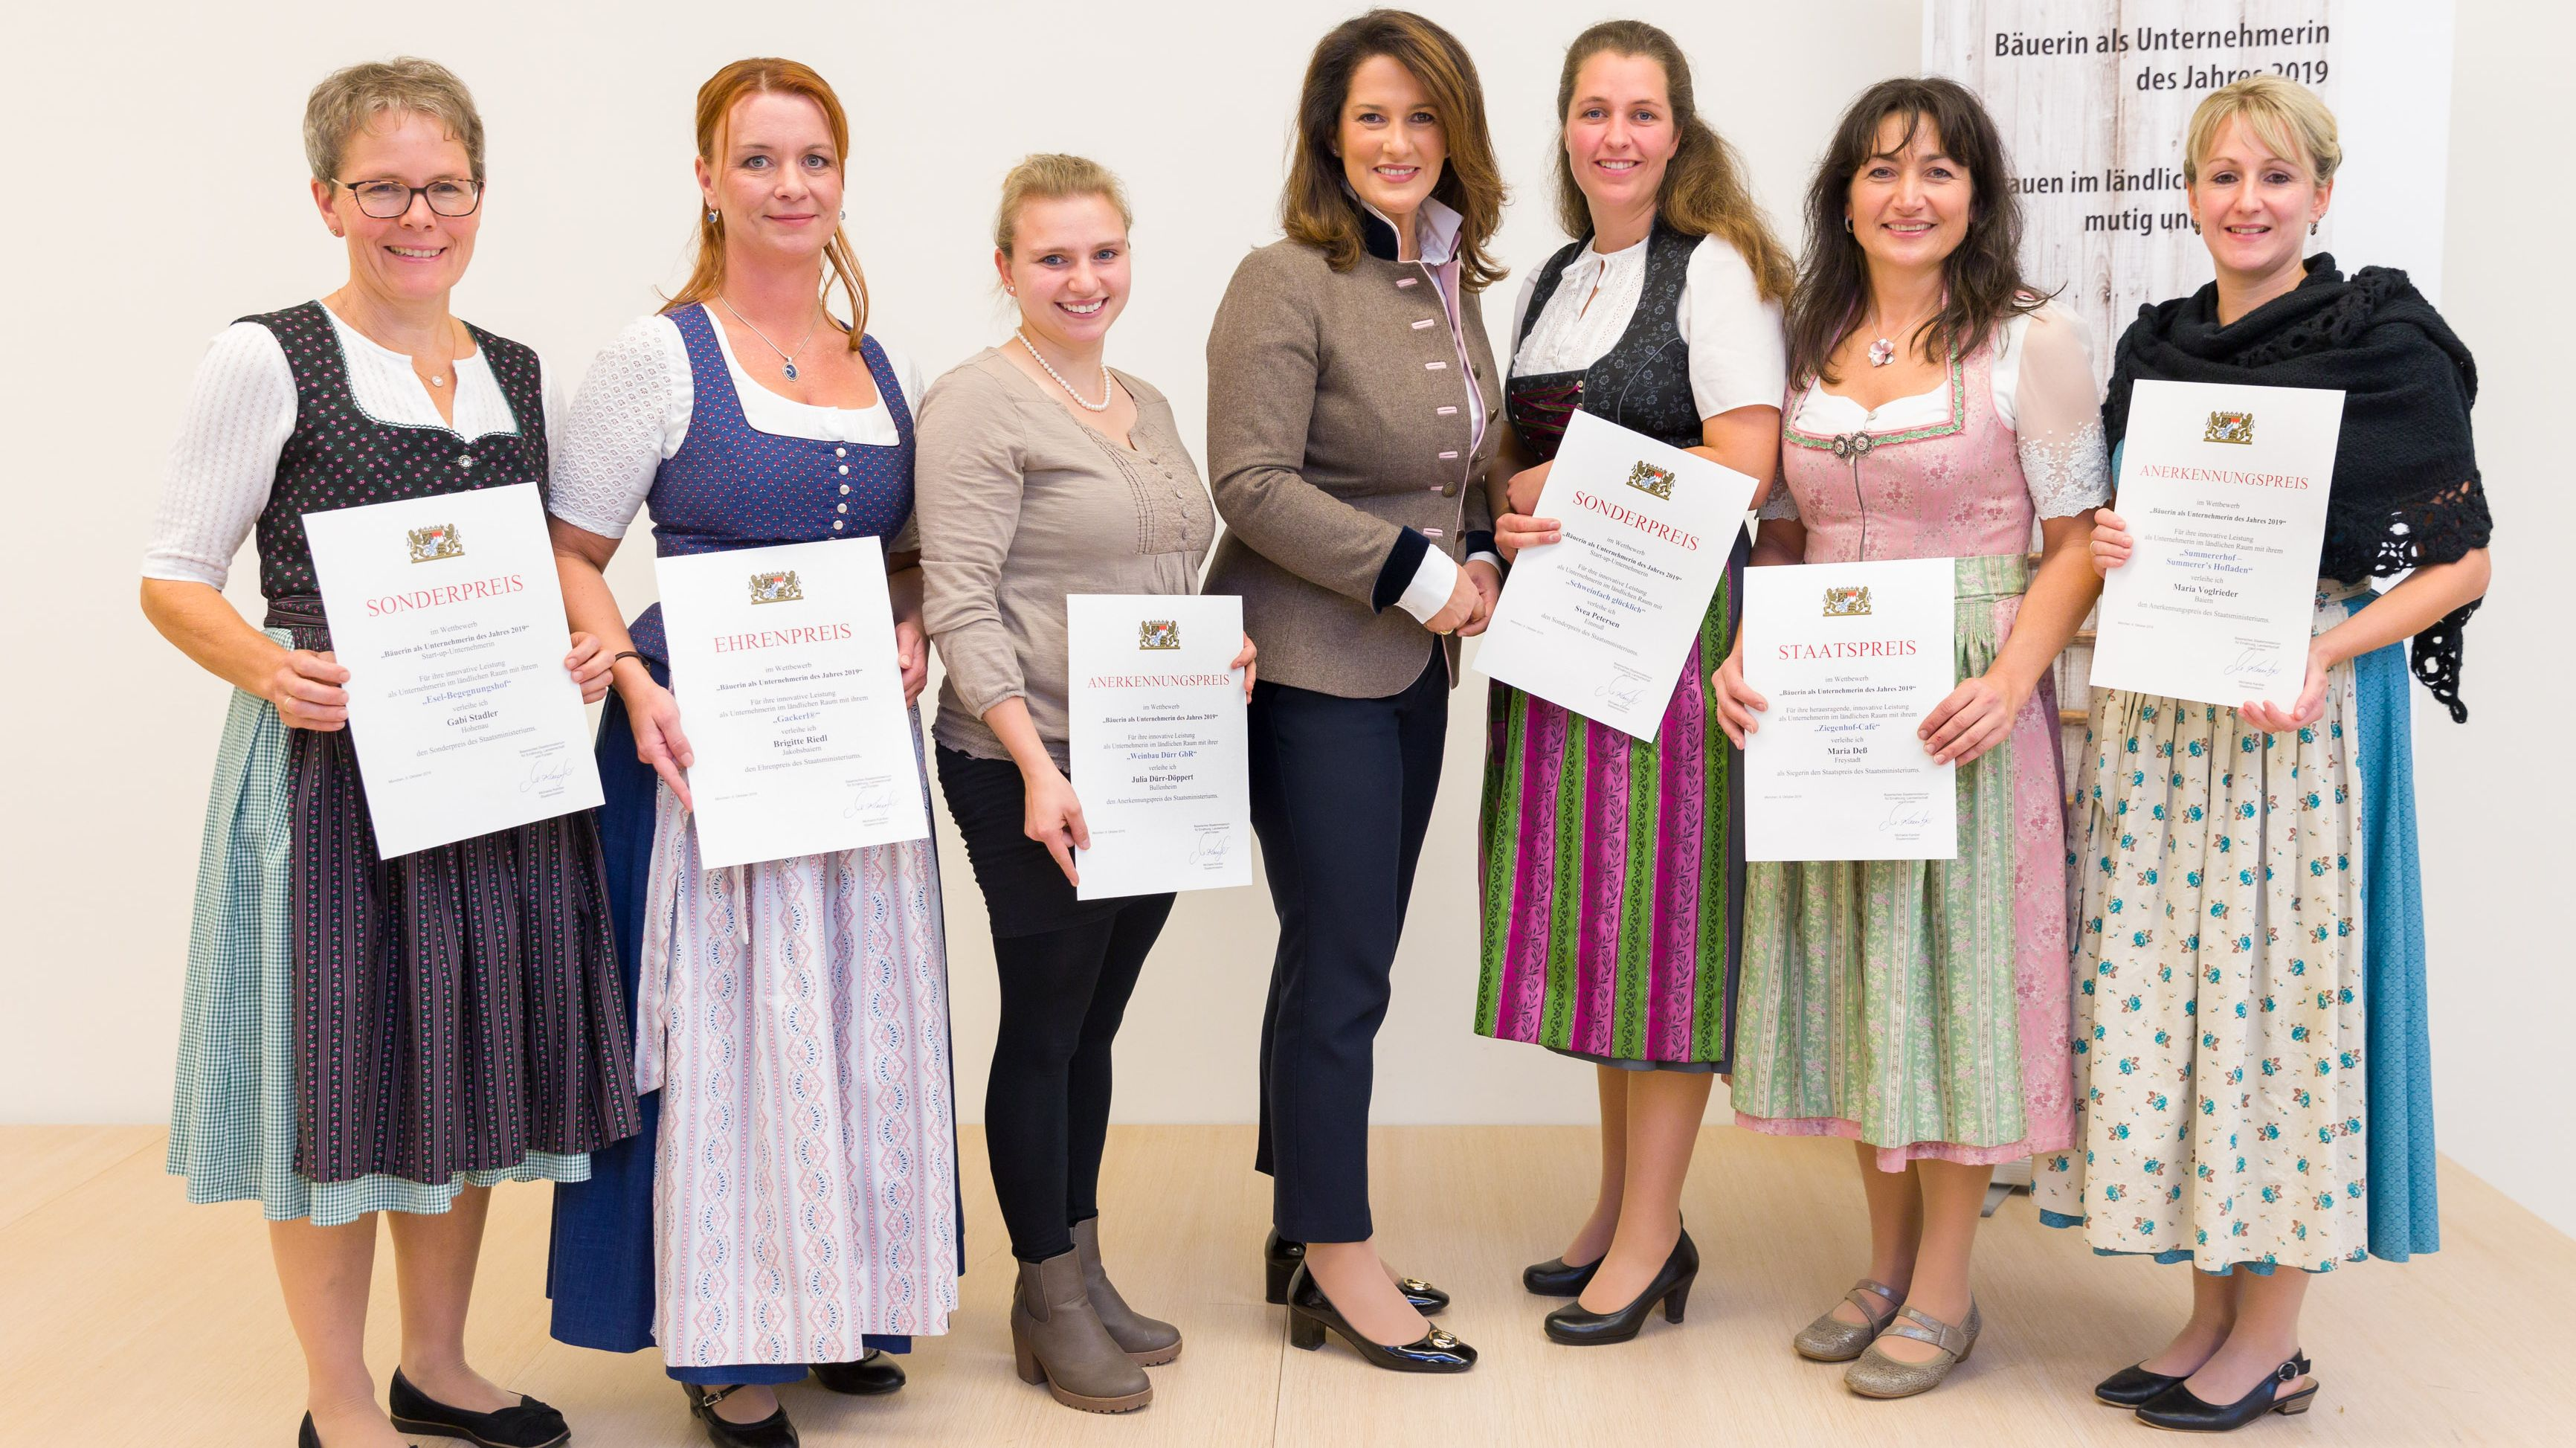 Ministerin Michaela Kaniber (CSU, Mitte) mit den Preisträgerinnen um Maria Deß (2.v.r)